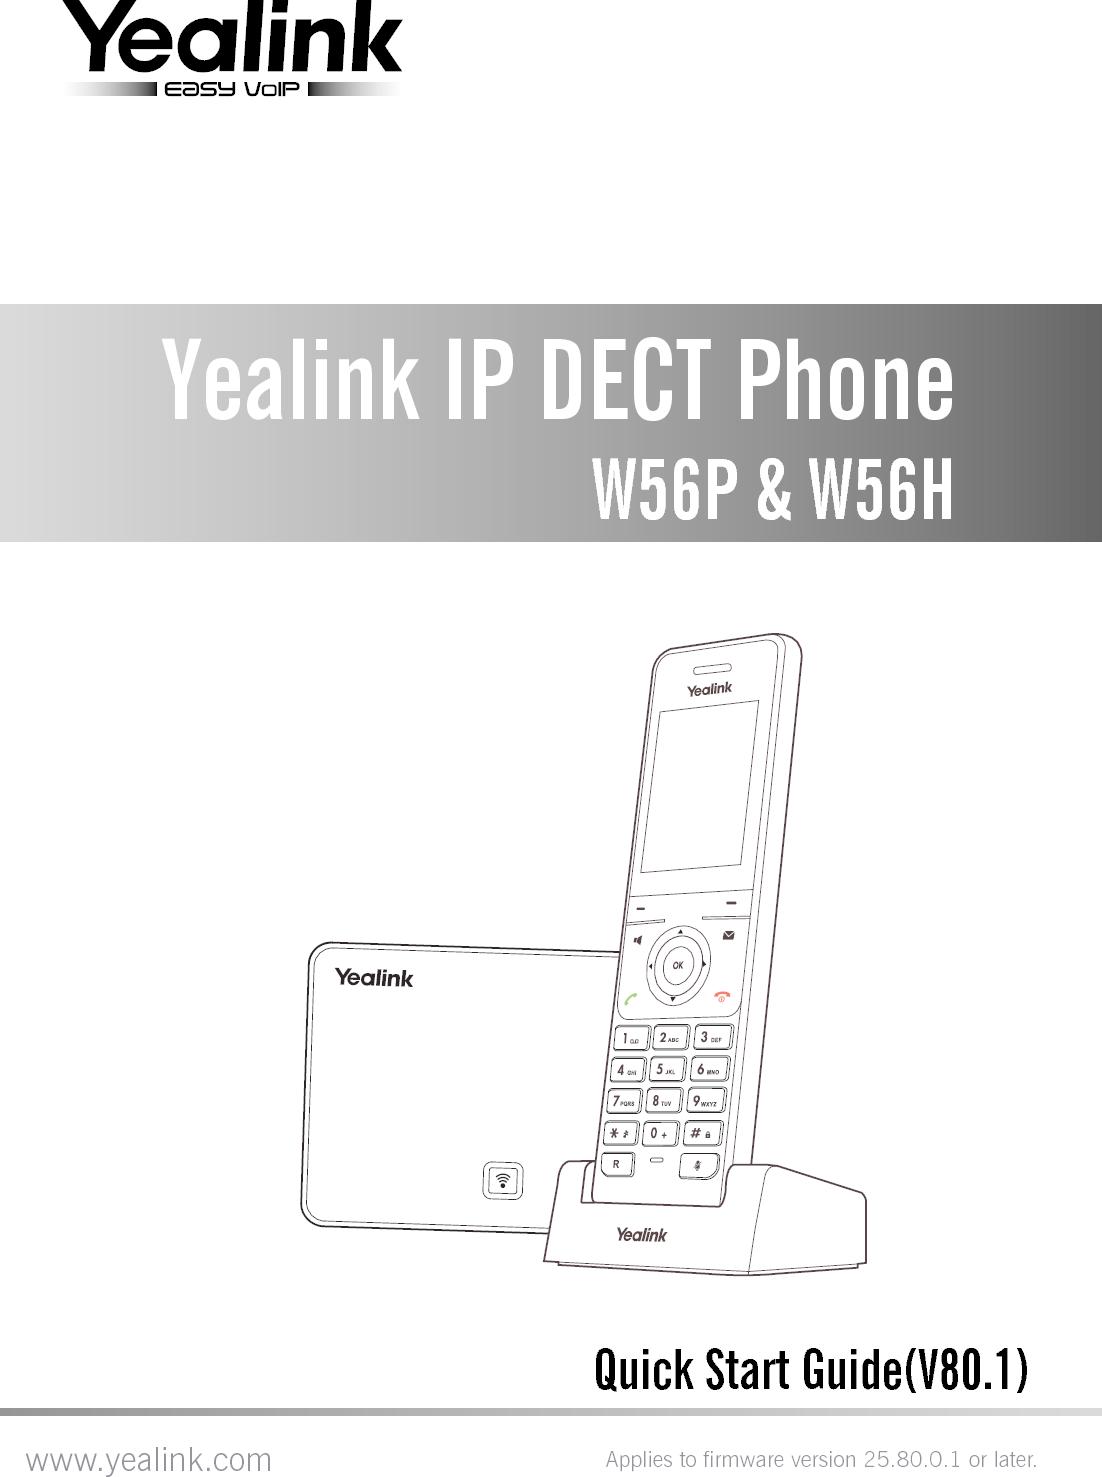 Yealink W56h Dect Ip Handset Manual Guide